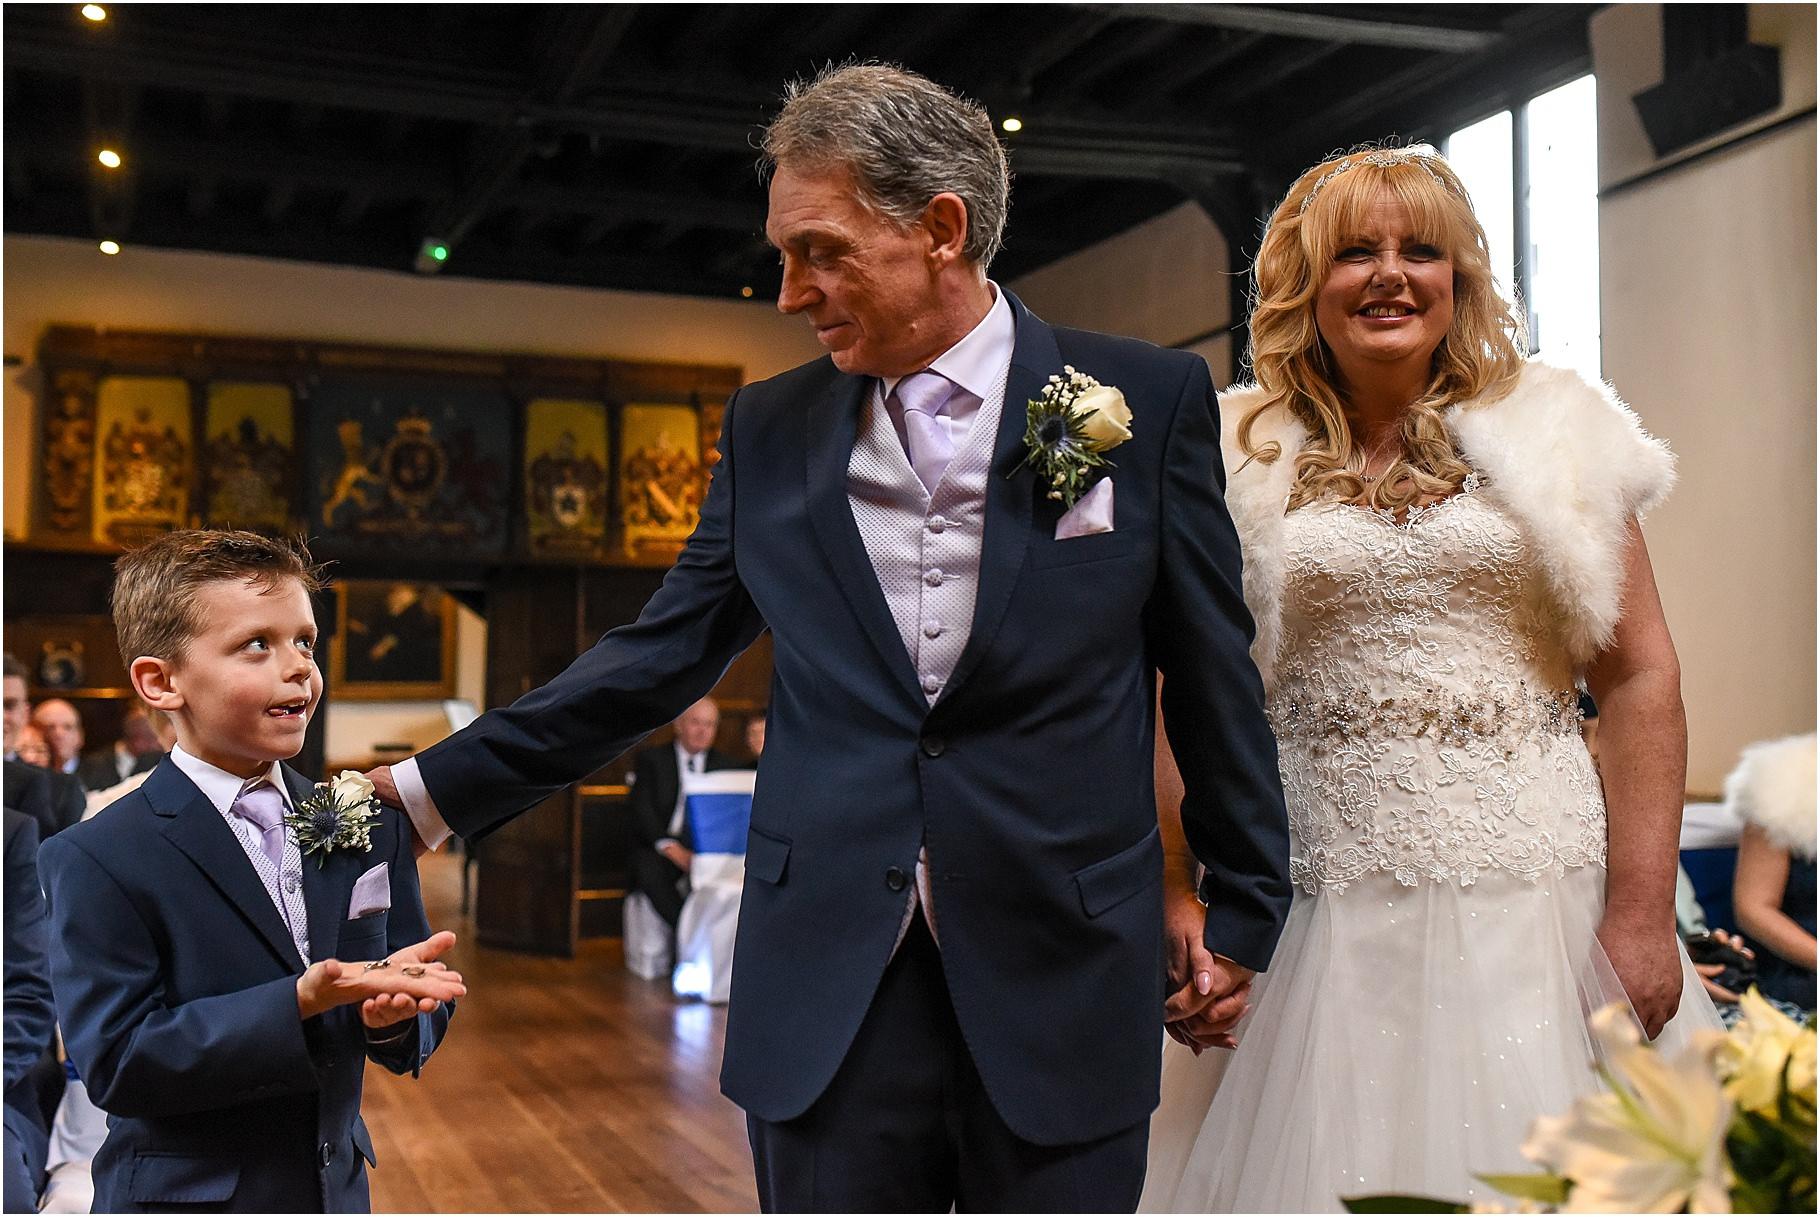 dan-wootton-photography-2017-weddings-122.jpg